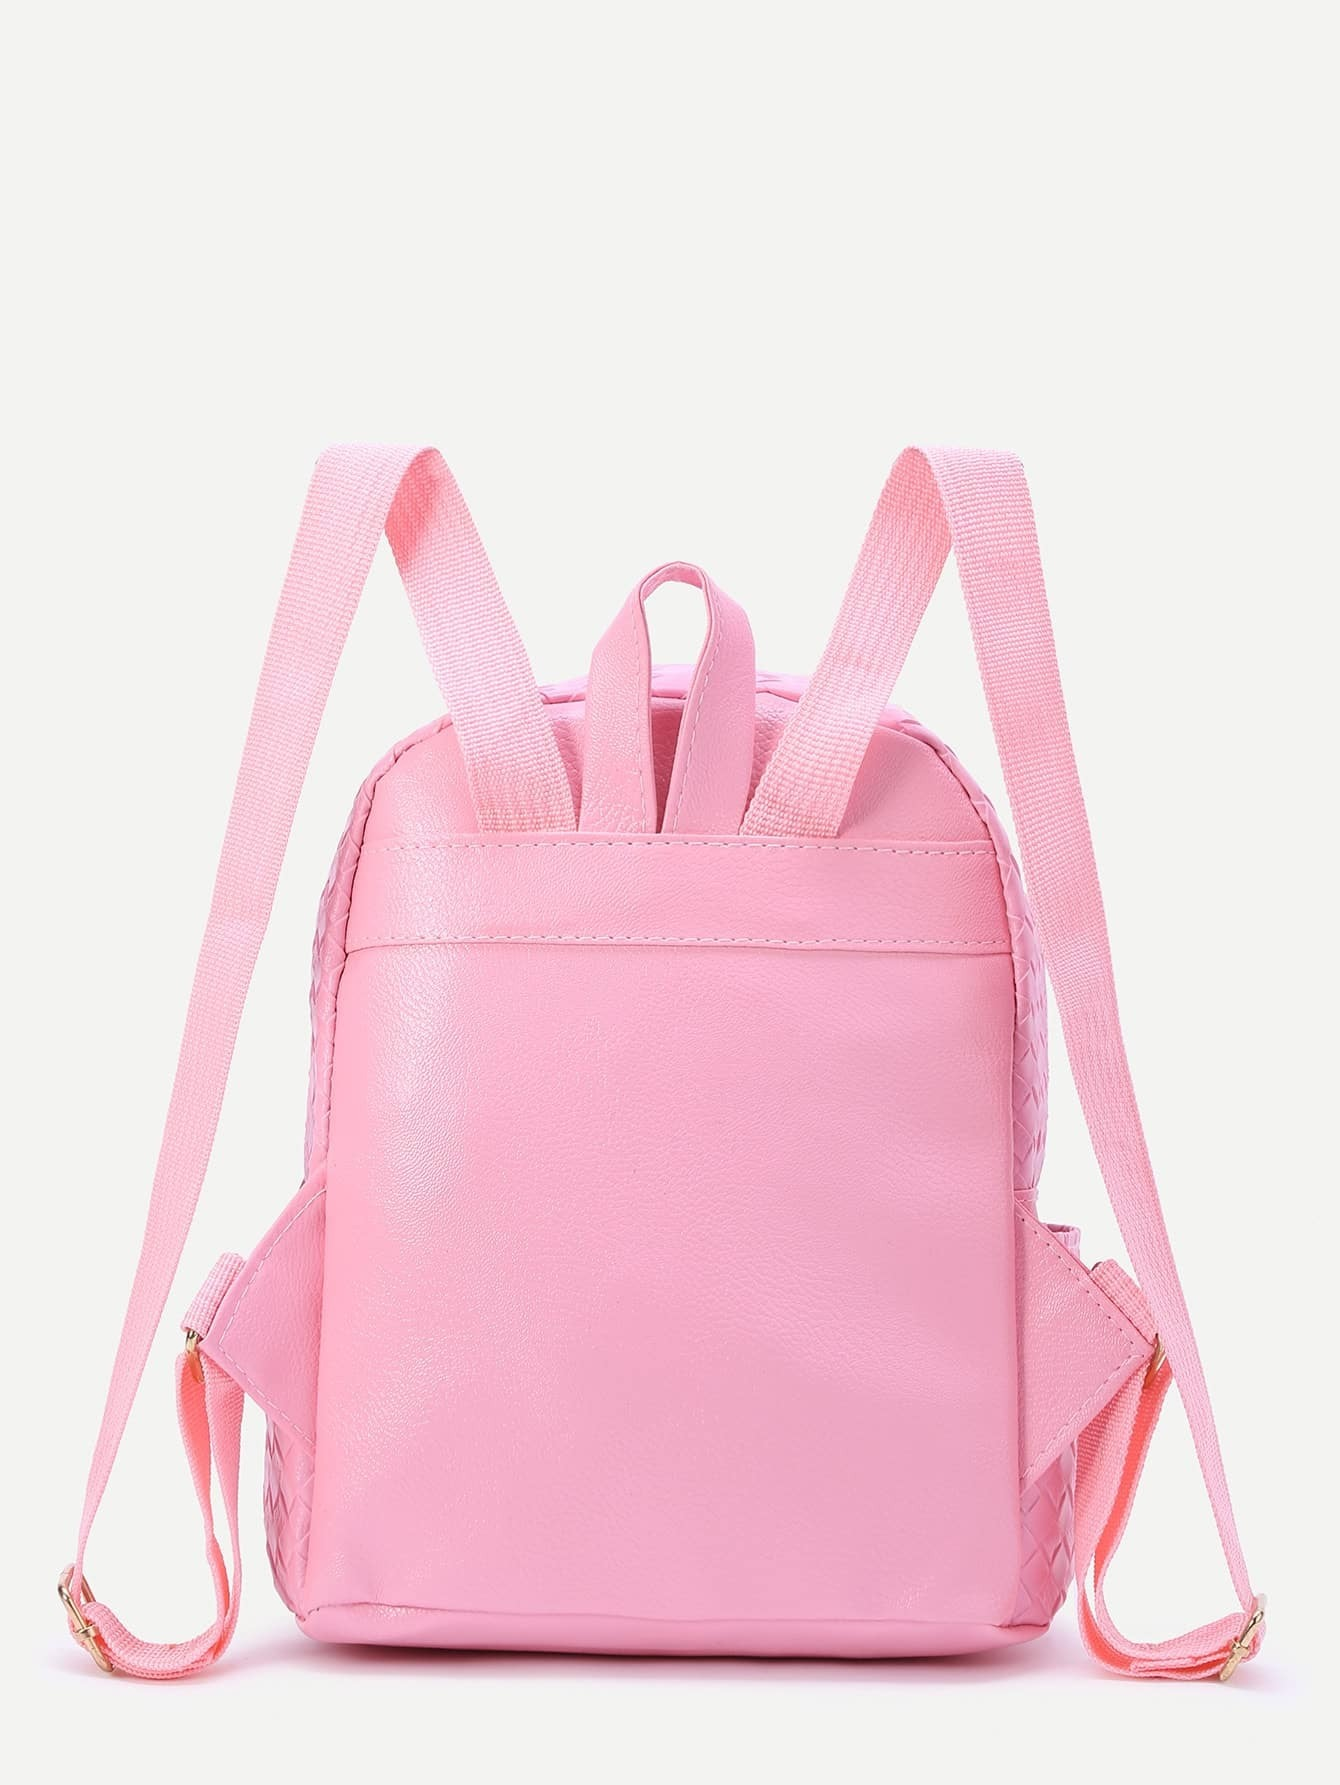 bag170217305_2